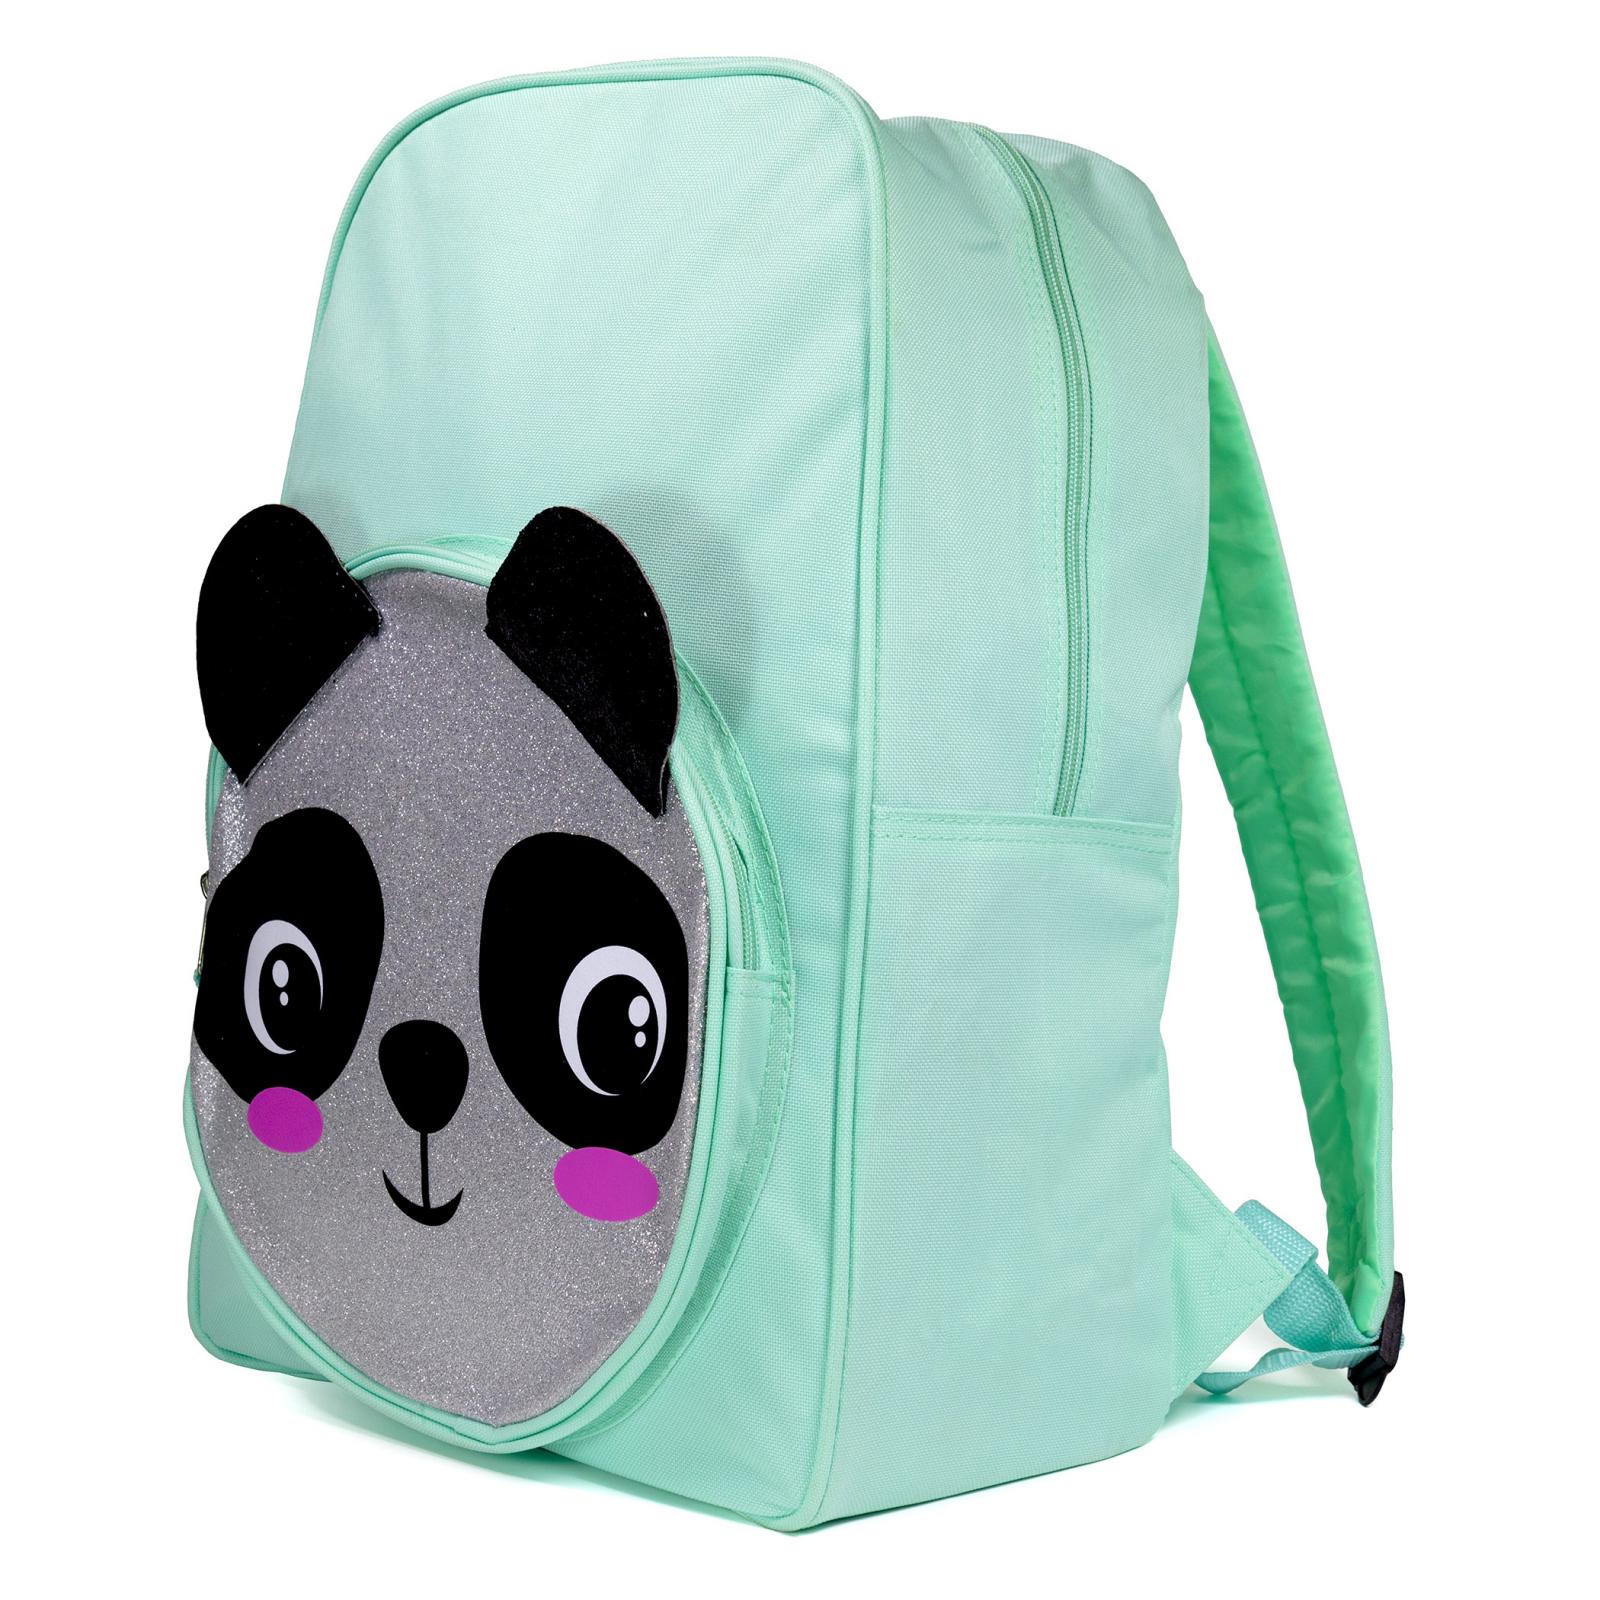 Kidplokio Children's School Backpack Critter Panda Face